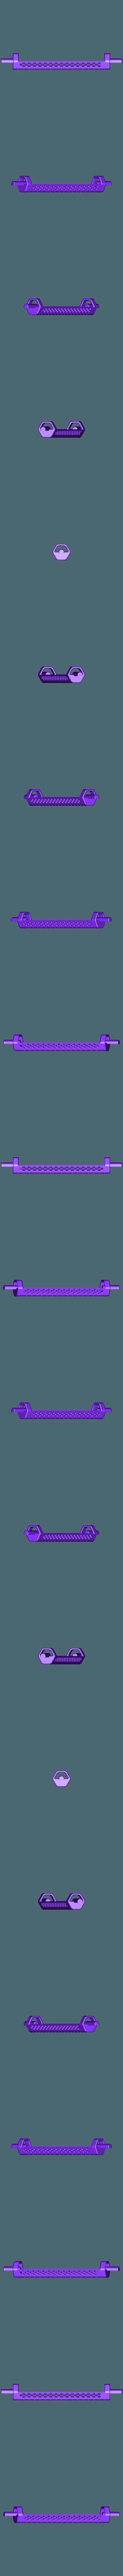 Tray 1.stl Download free STL file Clockwork pen carousel • 3D printing template, EvolvingExtrusions